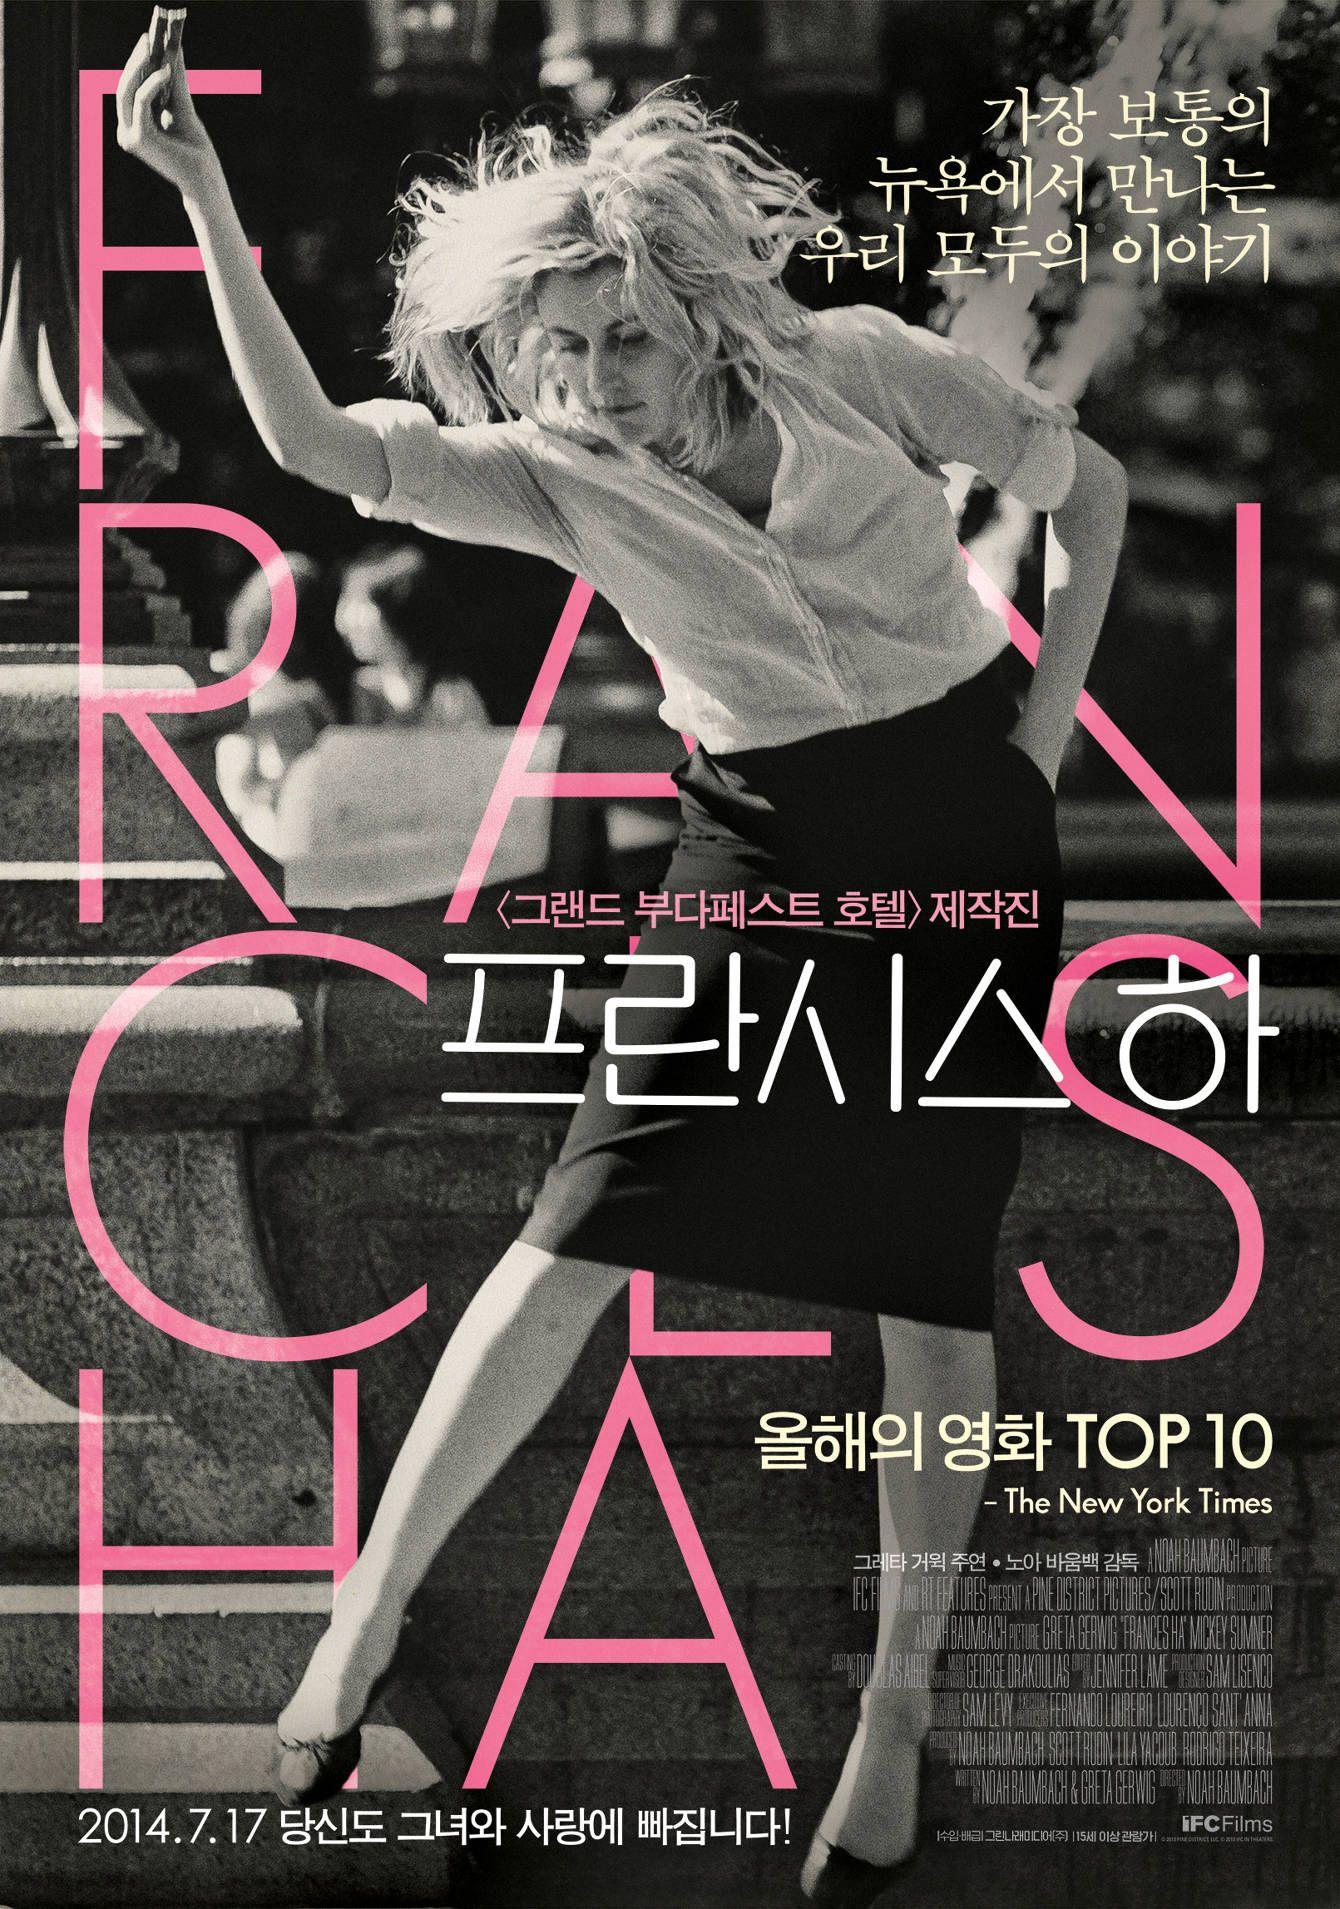 My Favorite Movie Poster Design Studio Pygmalion Movie Posters Design Frances Ha Movie Posters